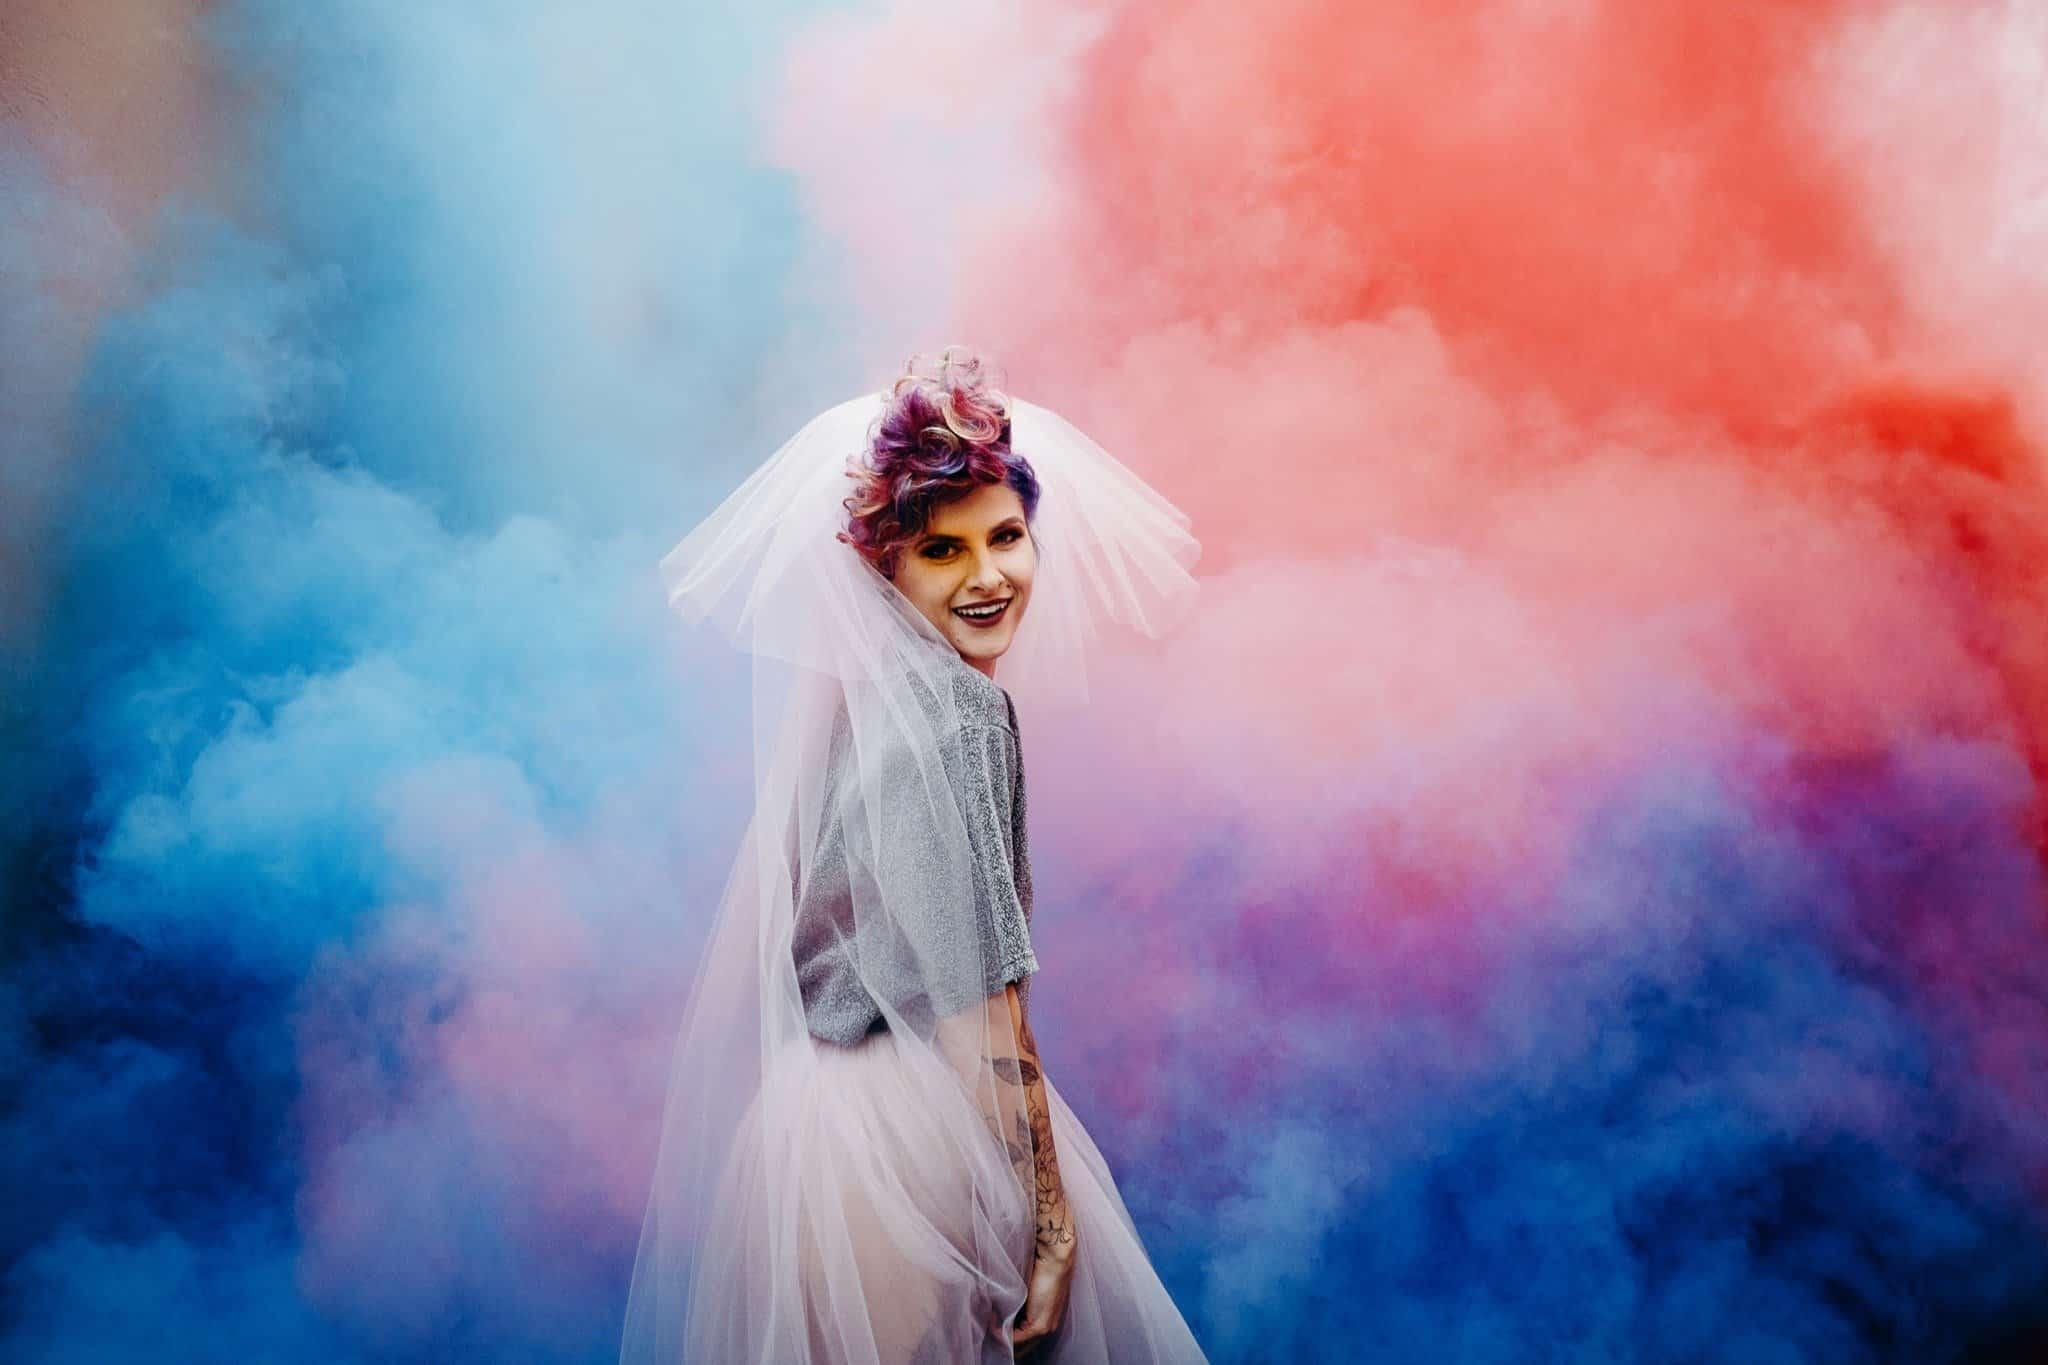 Creative Bridal Portrait in smoke